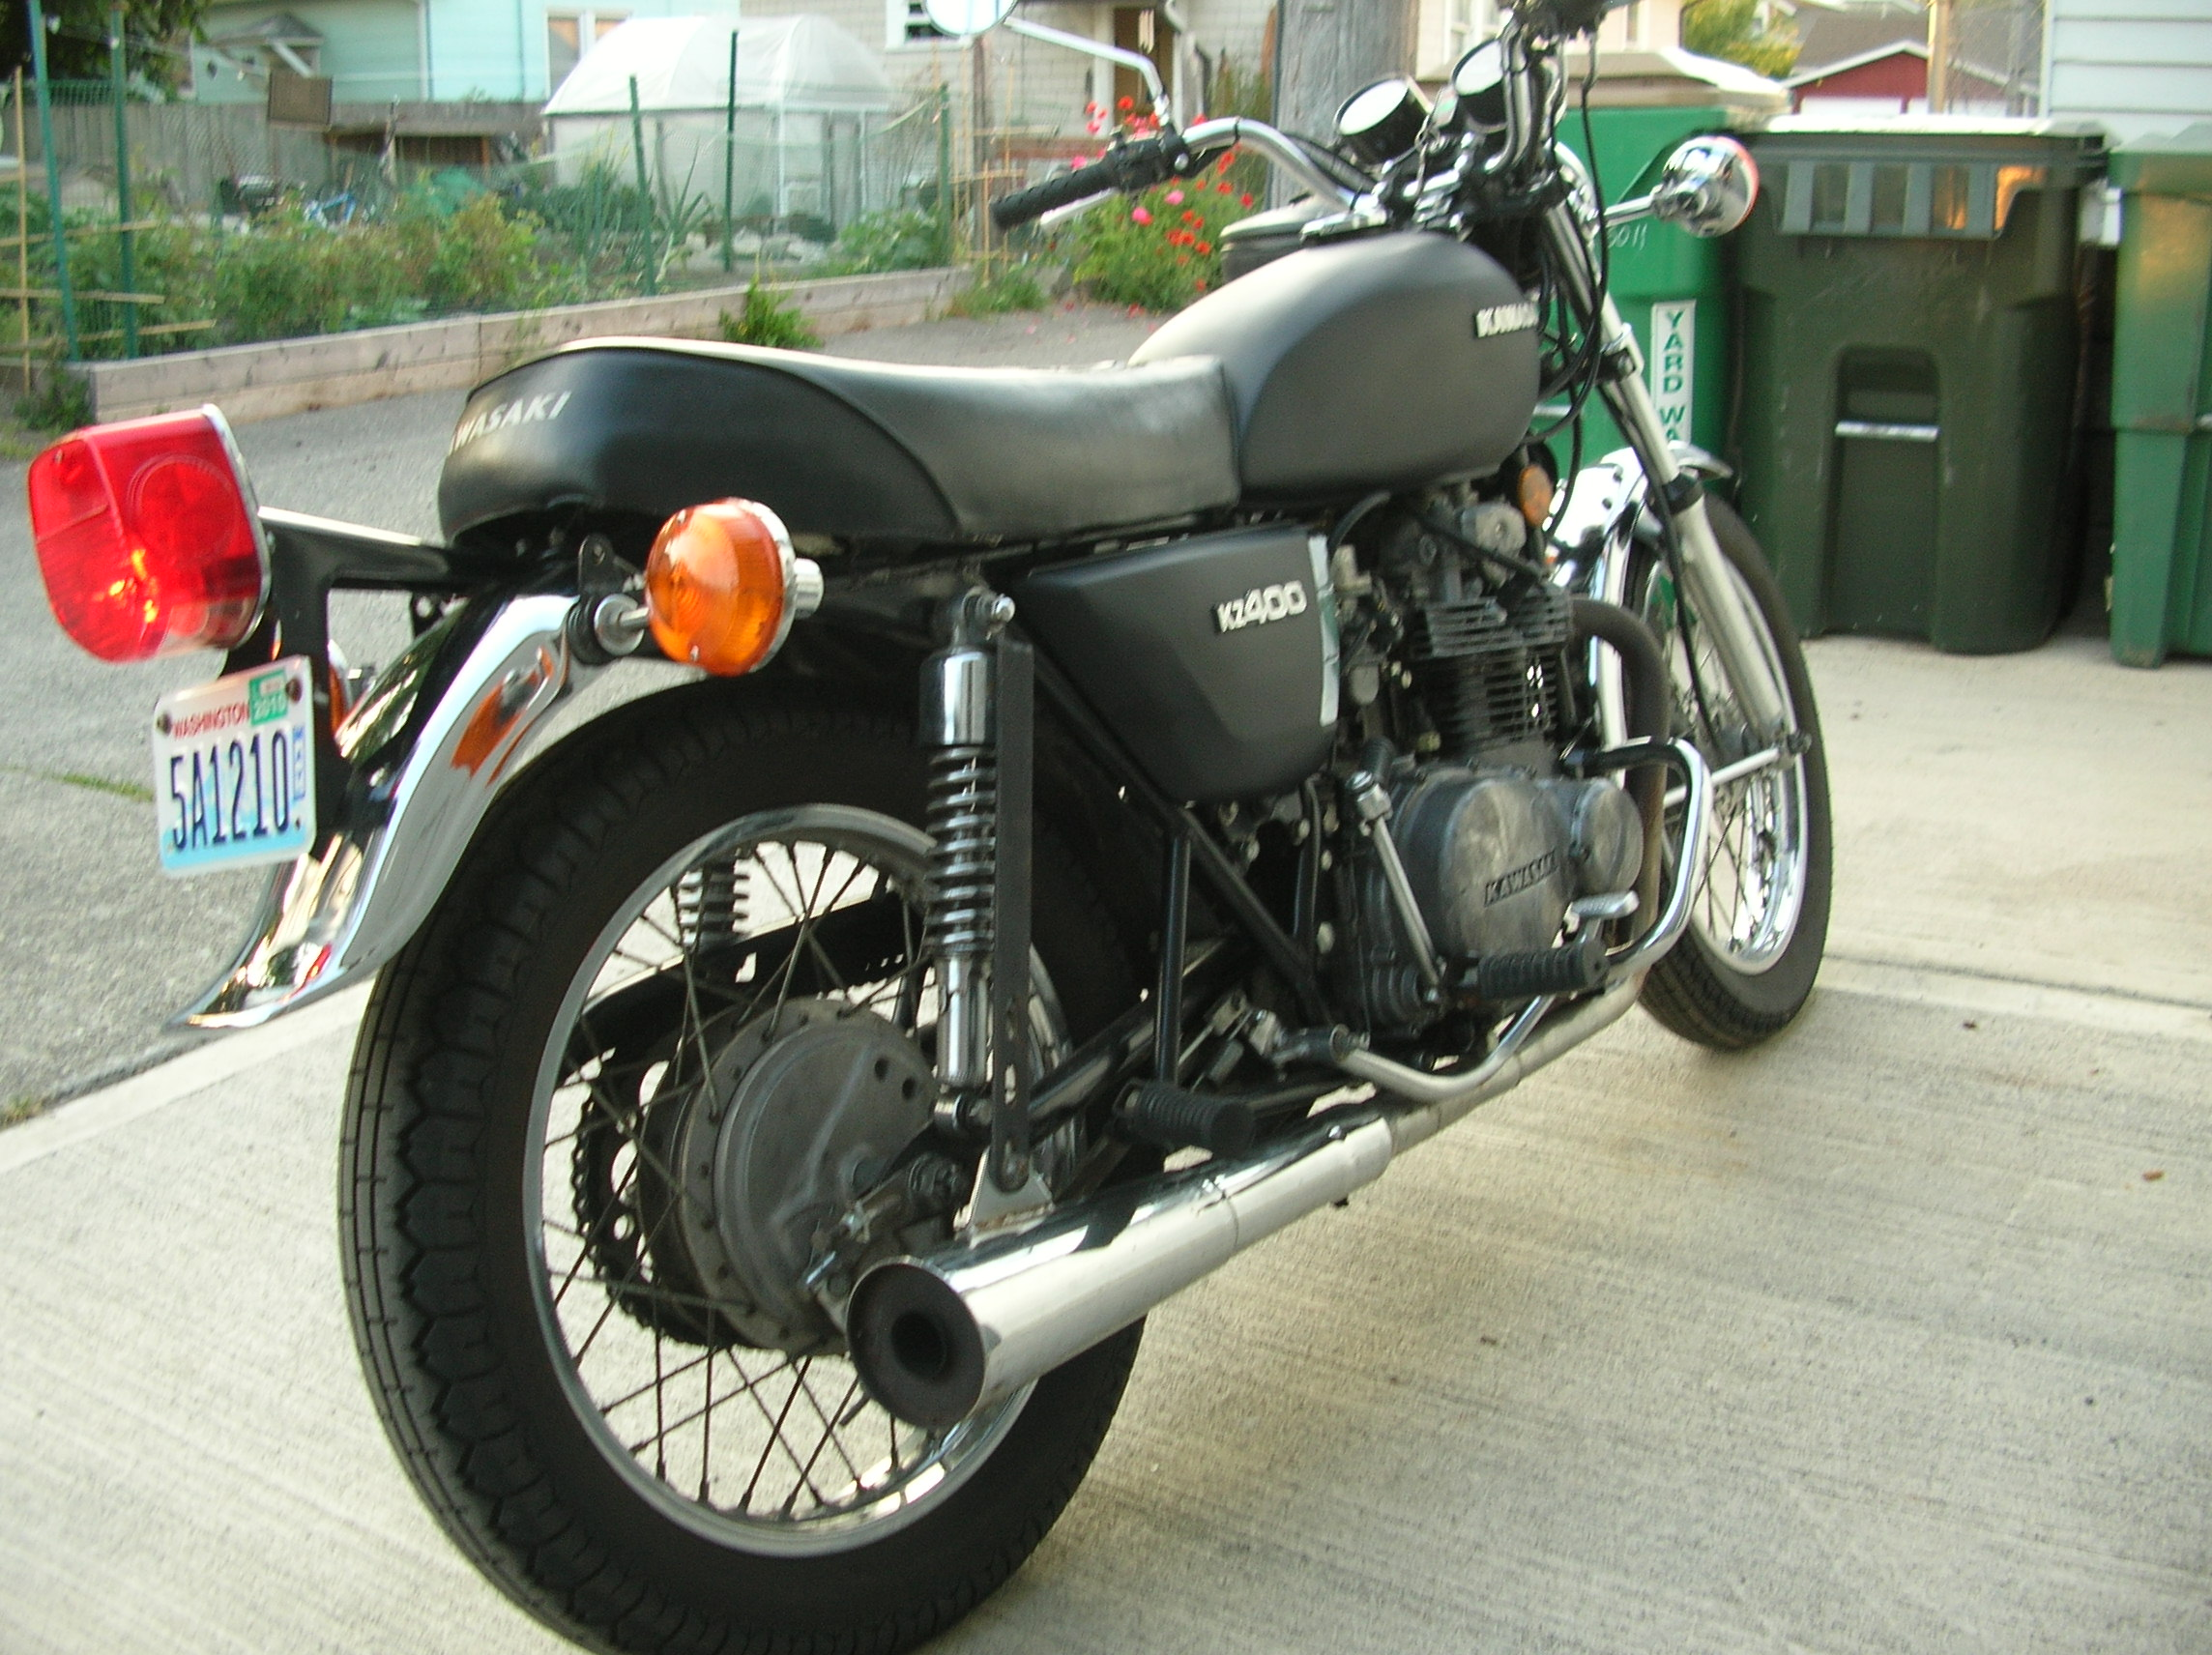 Youth With A Mission (YWAM) – 1976 Kawasaki KZ400 (Lazarus 1 ...